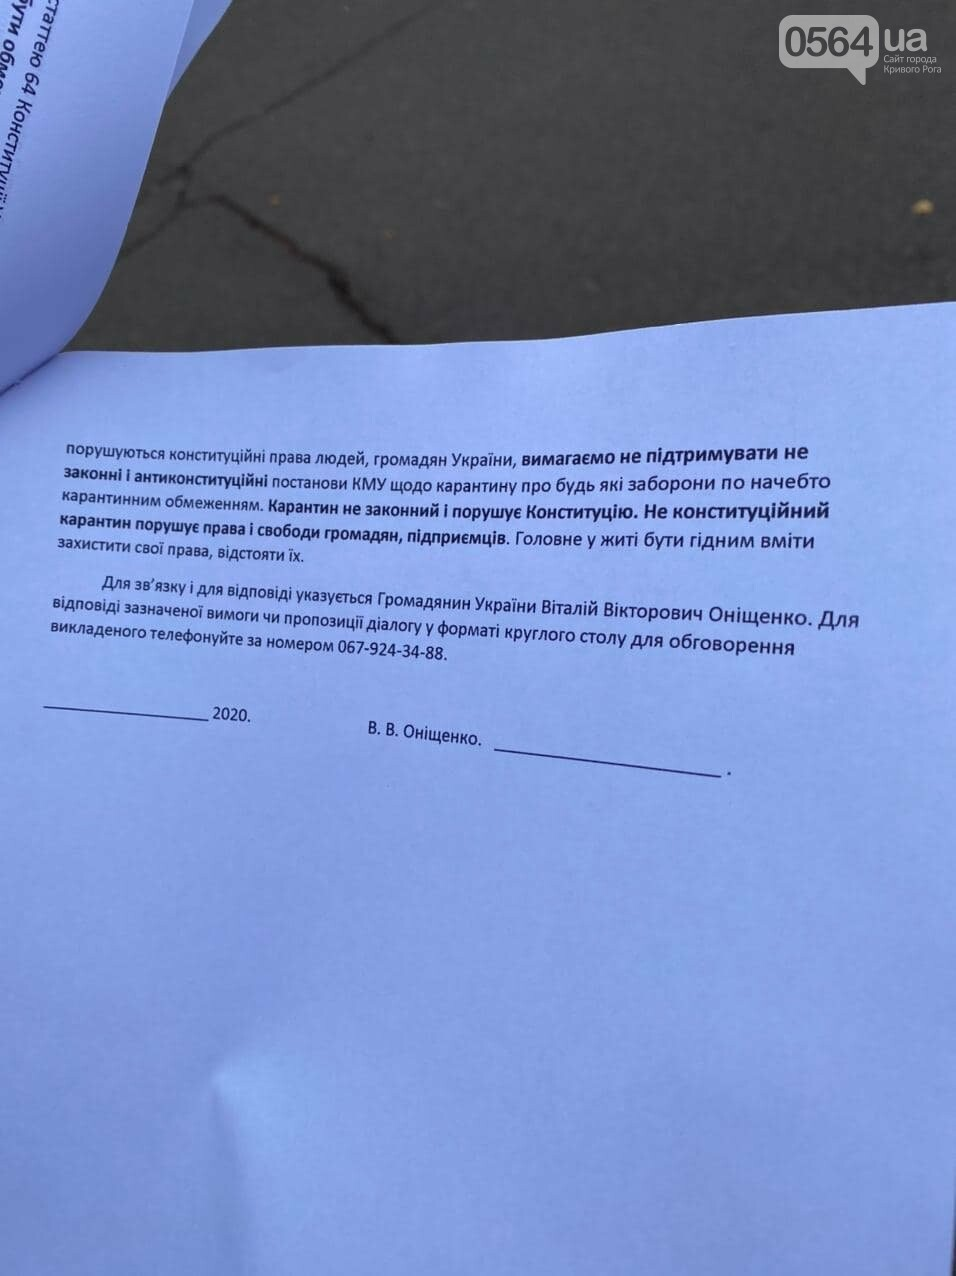 Представители малого бизнеса продолжили протест возле мэрии Кривого Рога, - ФОТО, ВИДЕО, фото-10